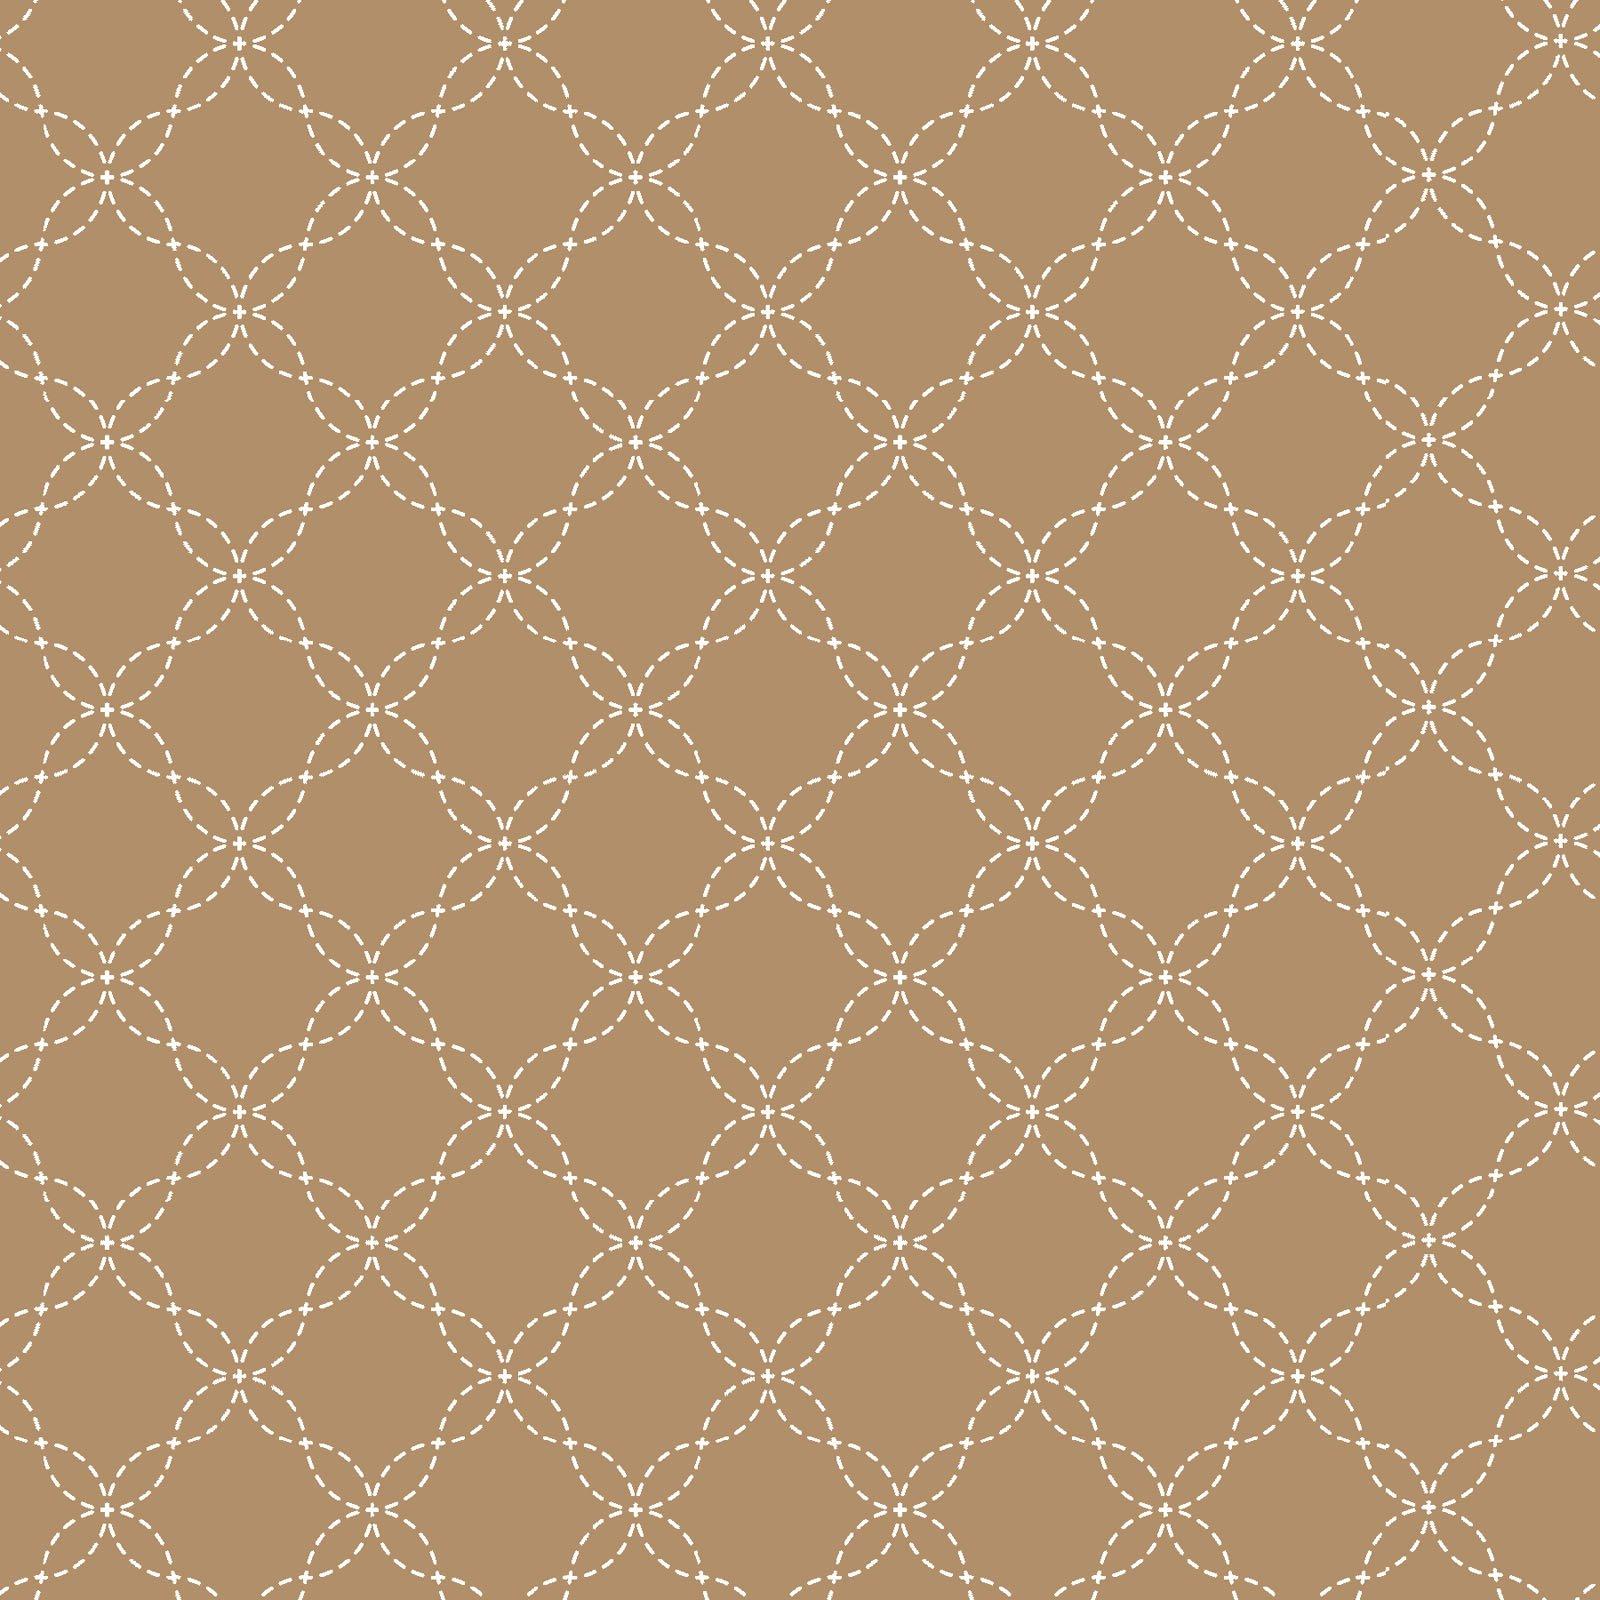 KimberBell Basics Brown Latttice 8209M-A